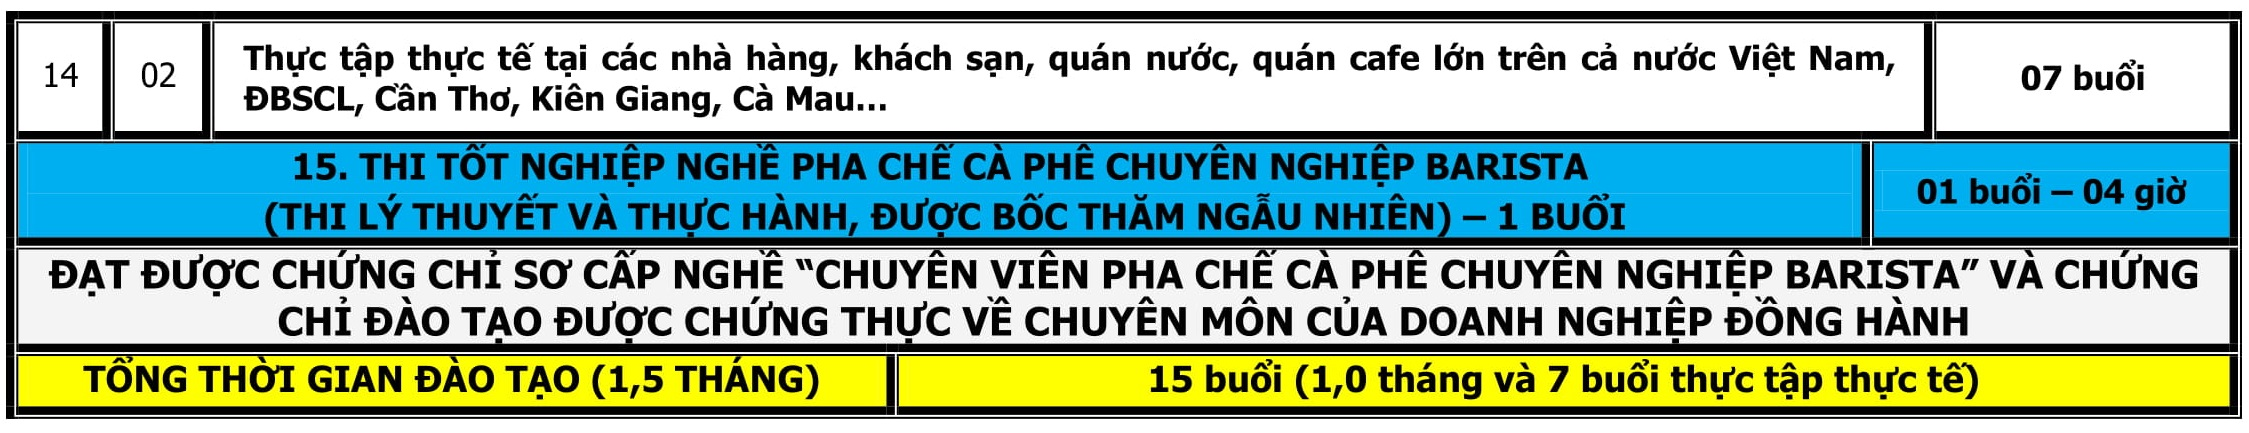 CT DAO TAO PHA CHE BARISTA-4